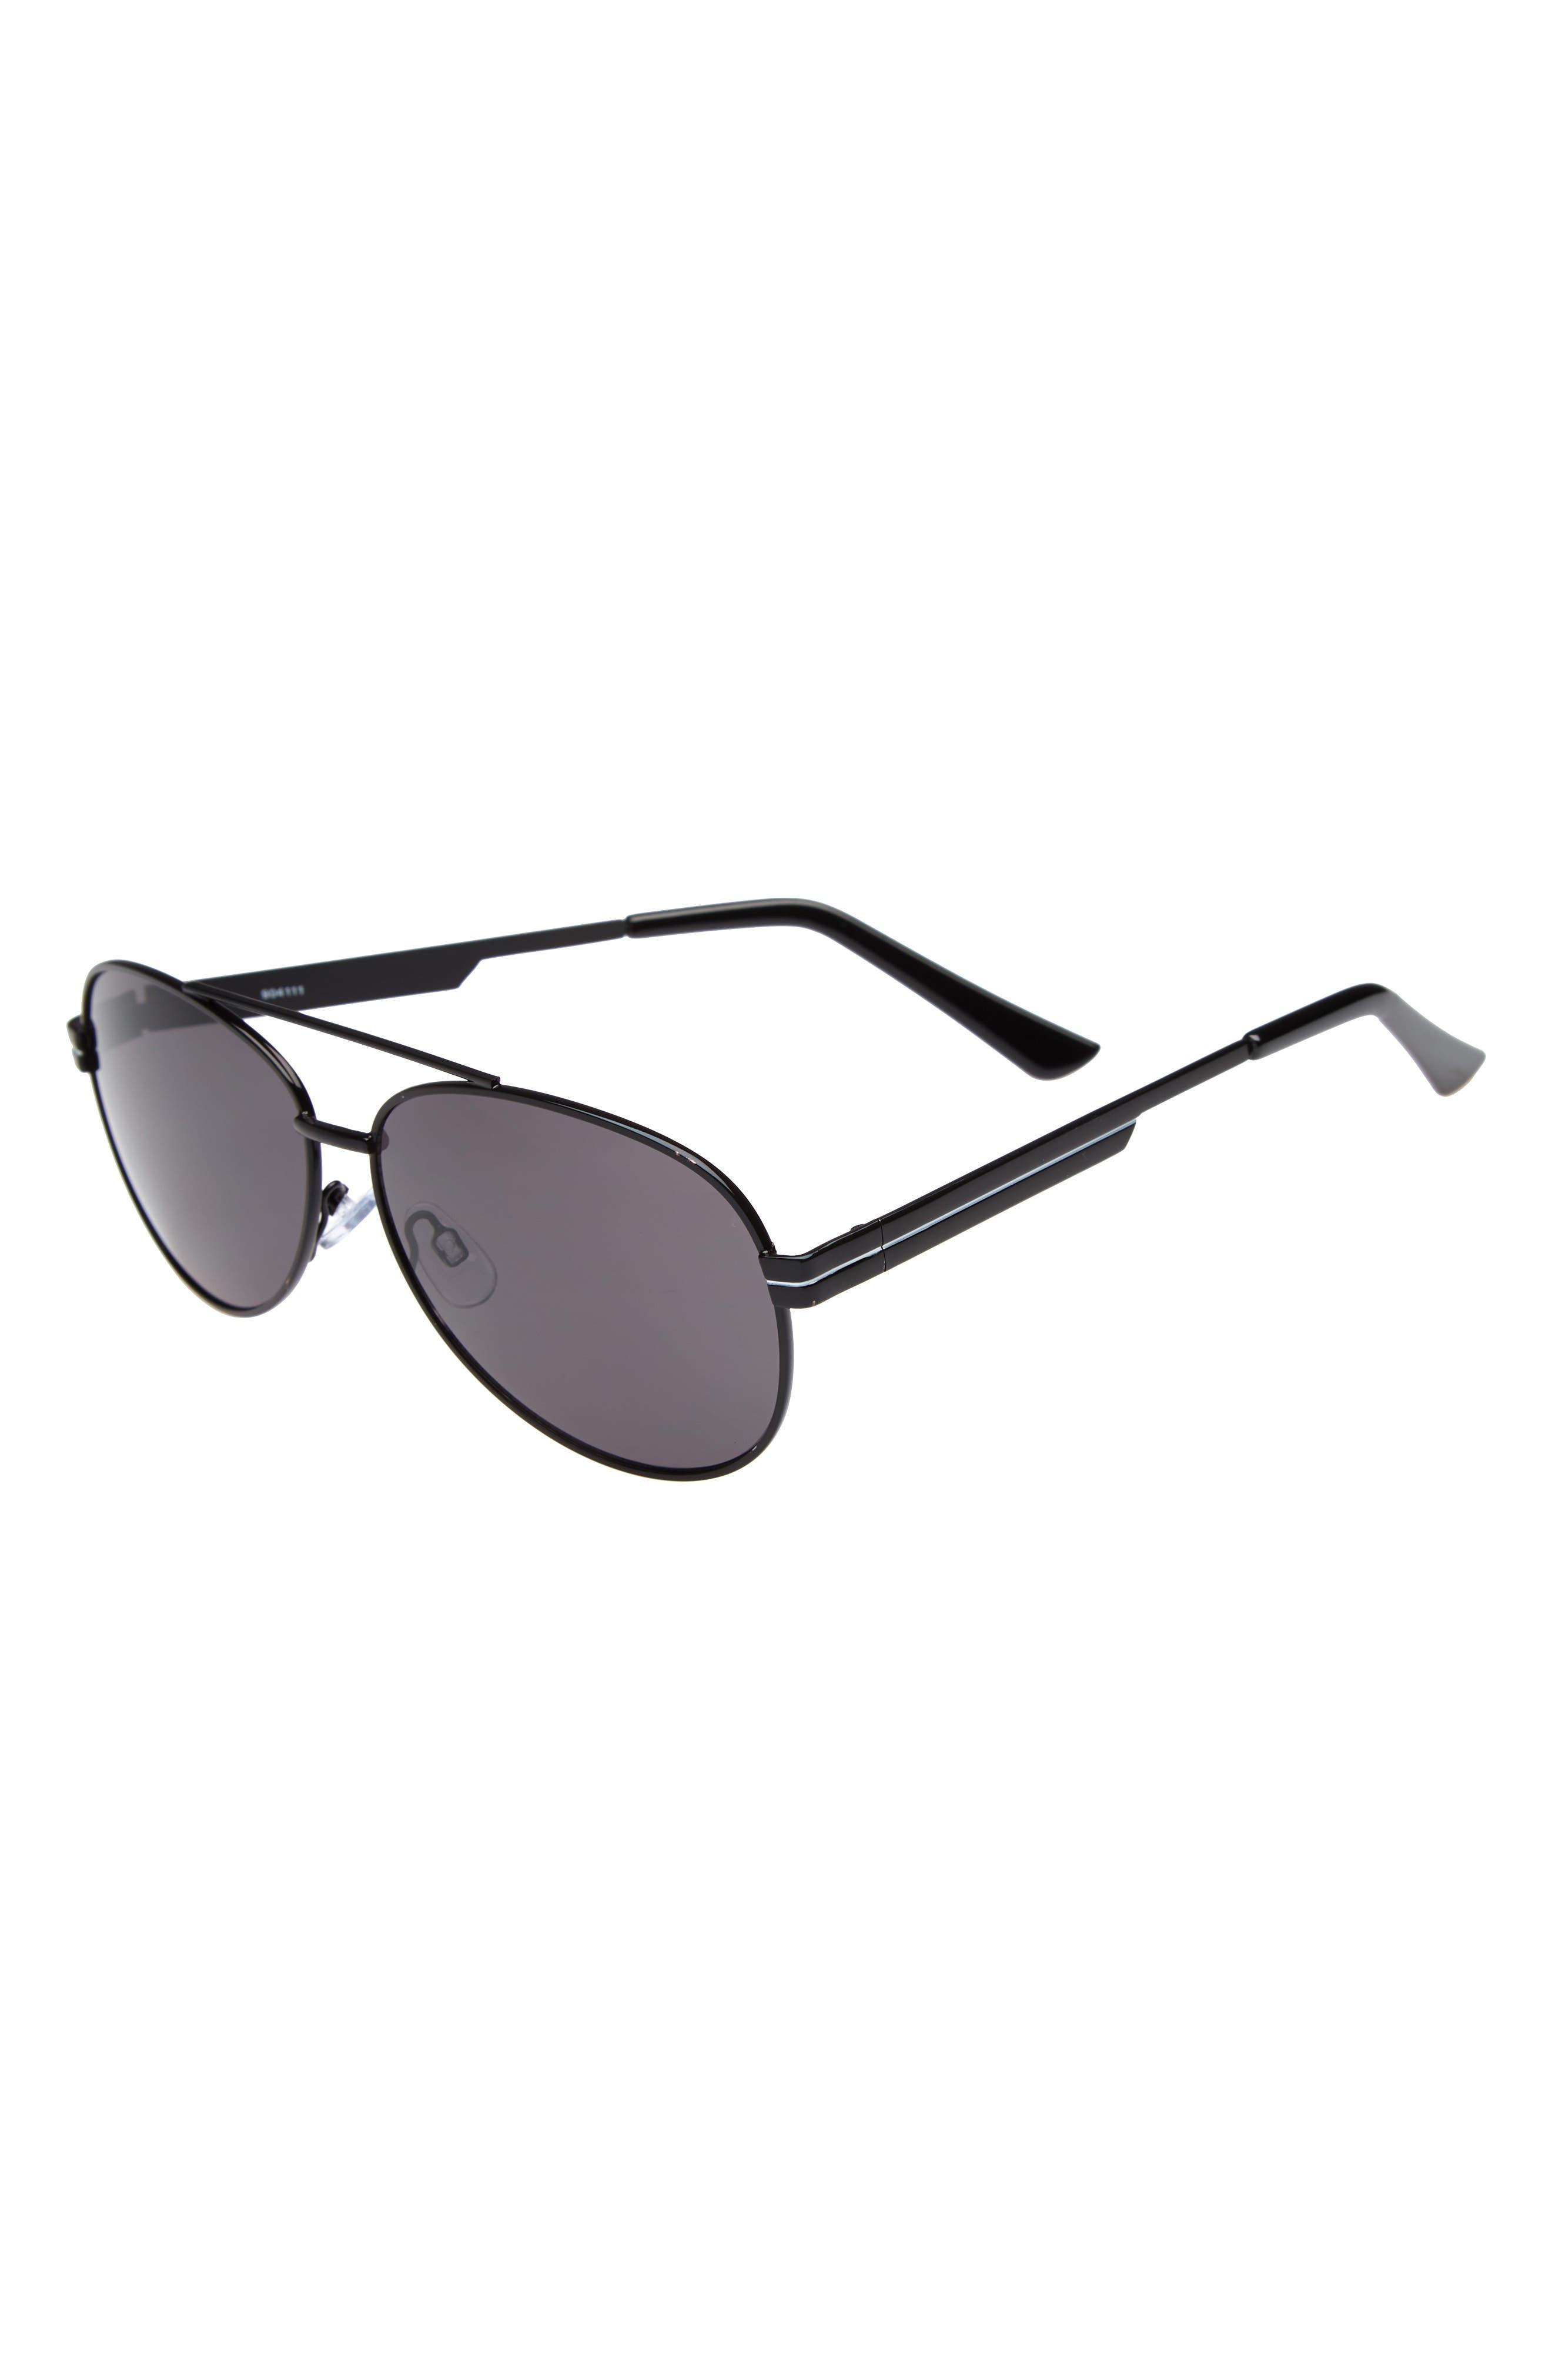 Starlight Accessories Aviator Sunglasses (Kids)